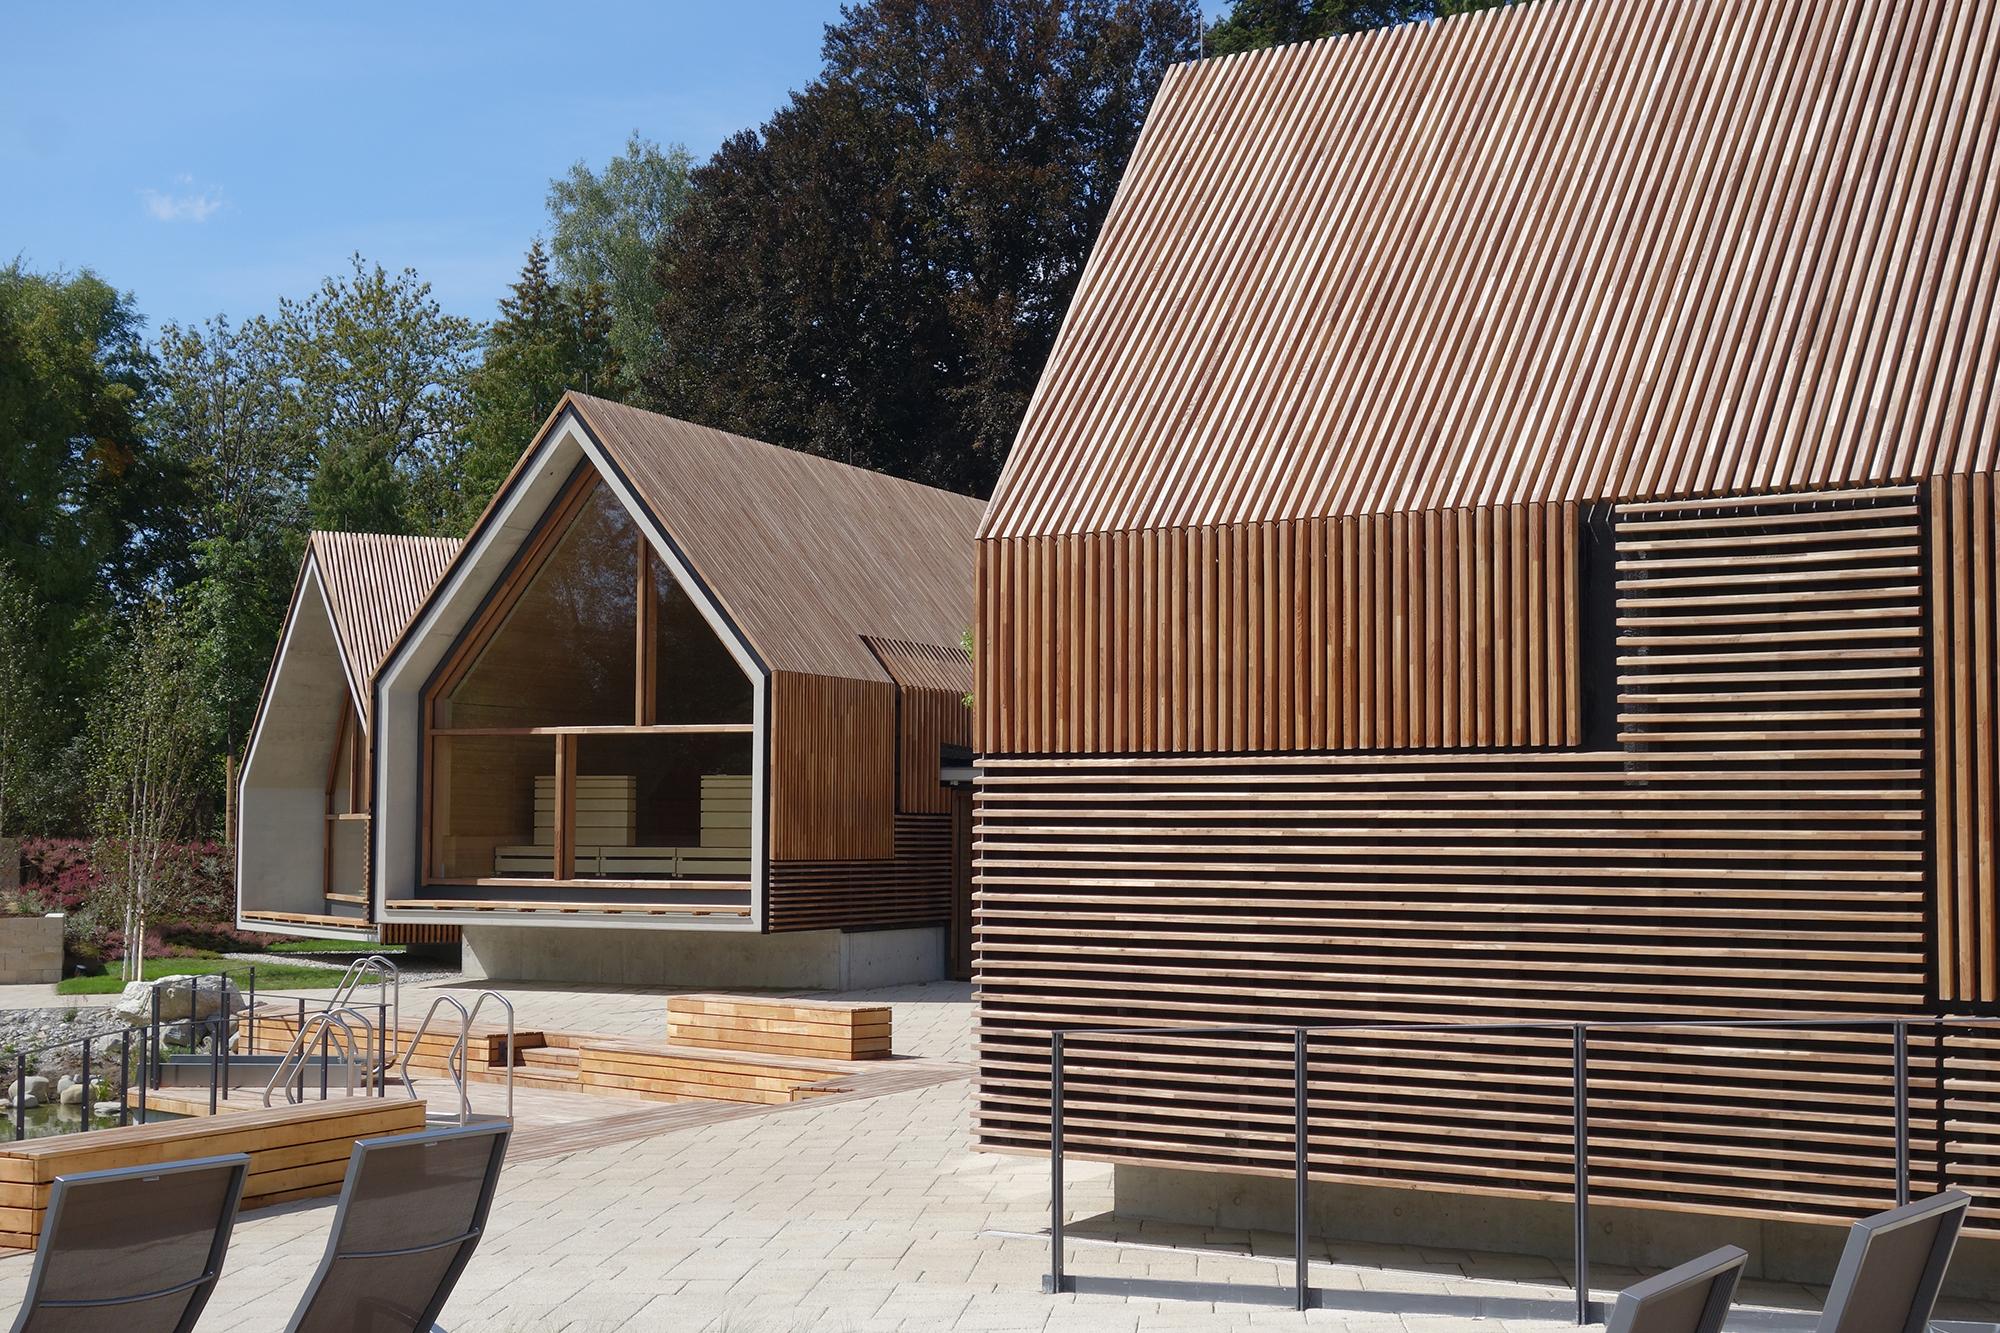 Parkhotel Jordanbad Sauna Village Wall Architect